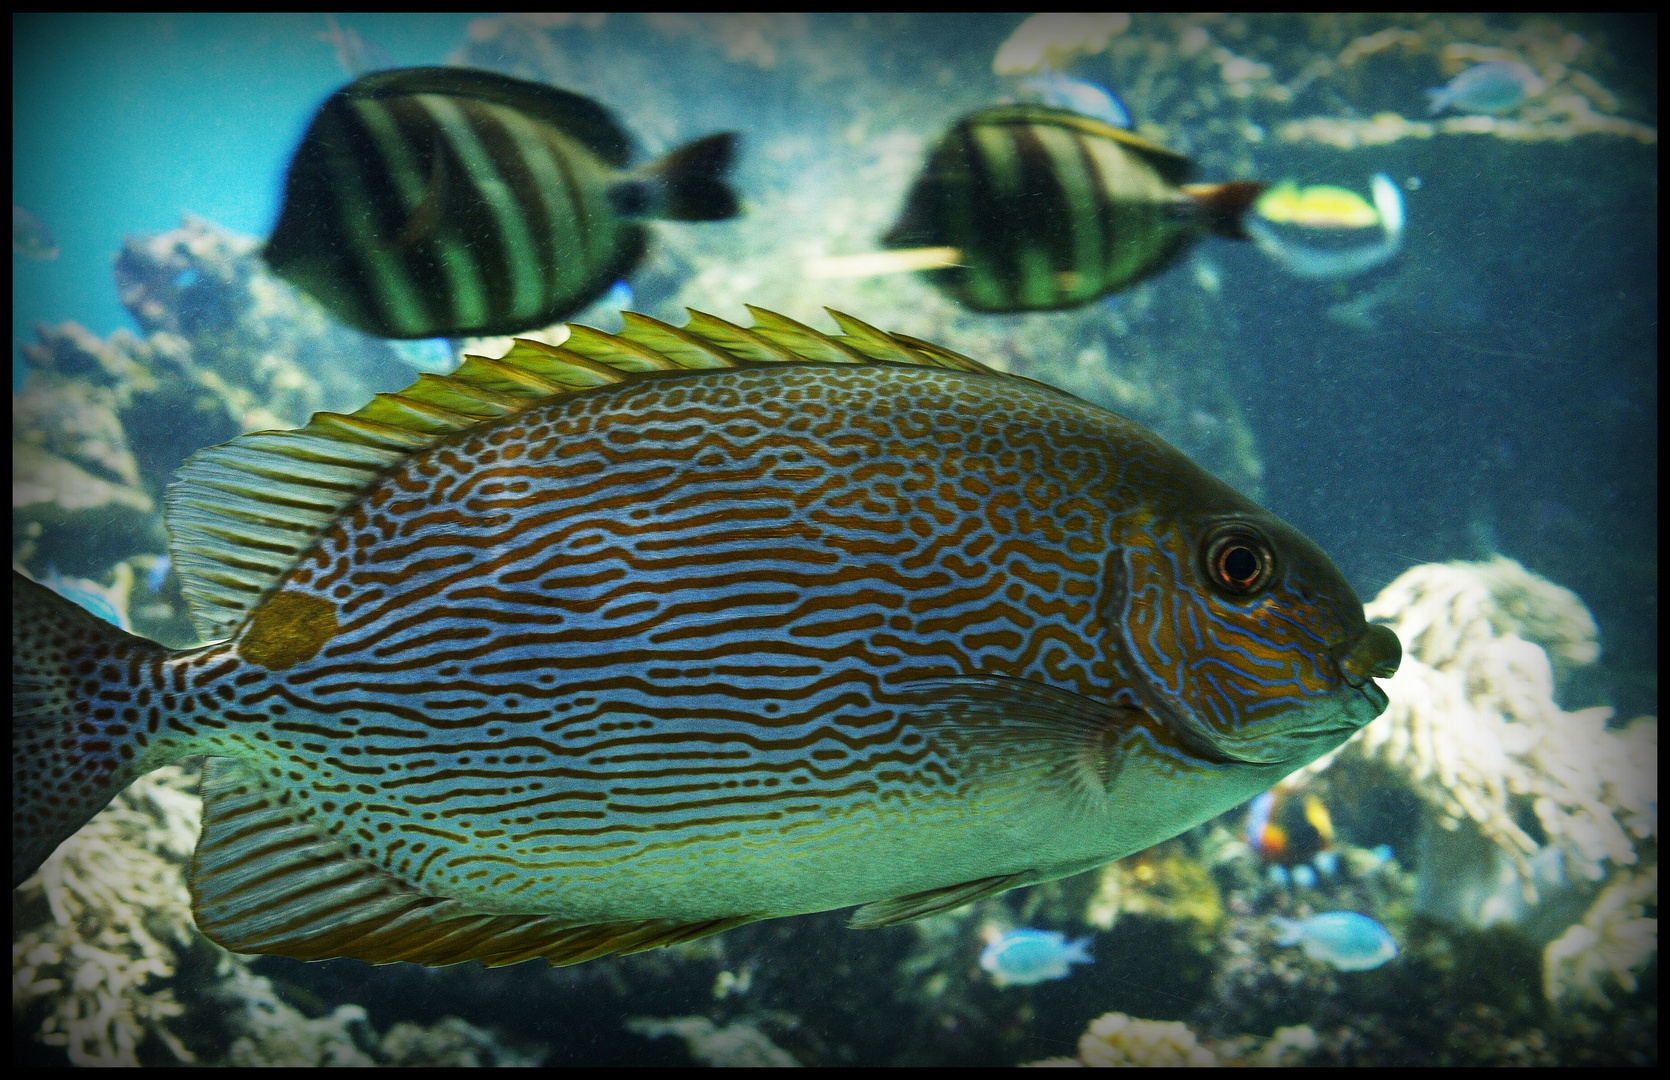 noum a aquarium des lagons 3 cordonnier ligne siganus lineatus photo et image animaux. Black Bedroom Furniture Sets. Home Design Ideas